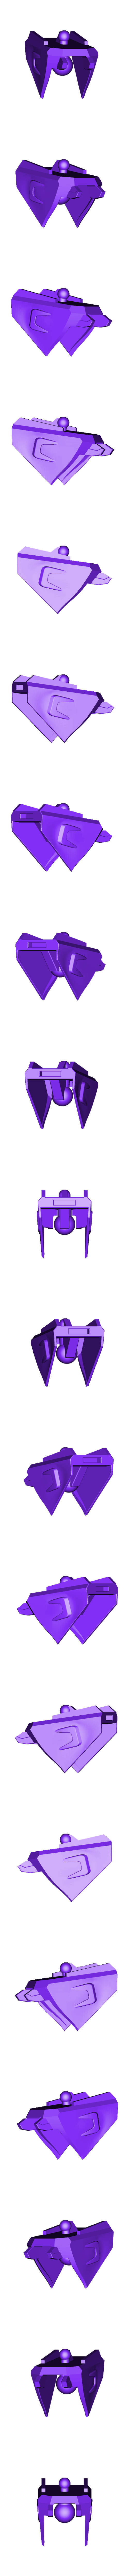 4_Drag_Head4_Neck1_BLACK.stl Download STL file ARTICULATED DRAGONLORD (not Dragonzord) - NO SUPPORT • 3D printer model, Toymakr3D